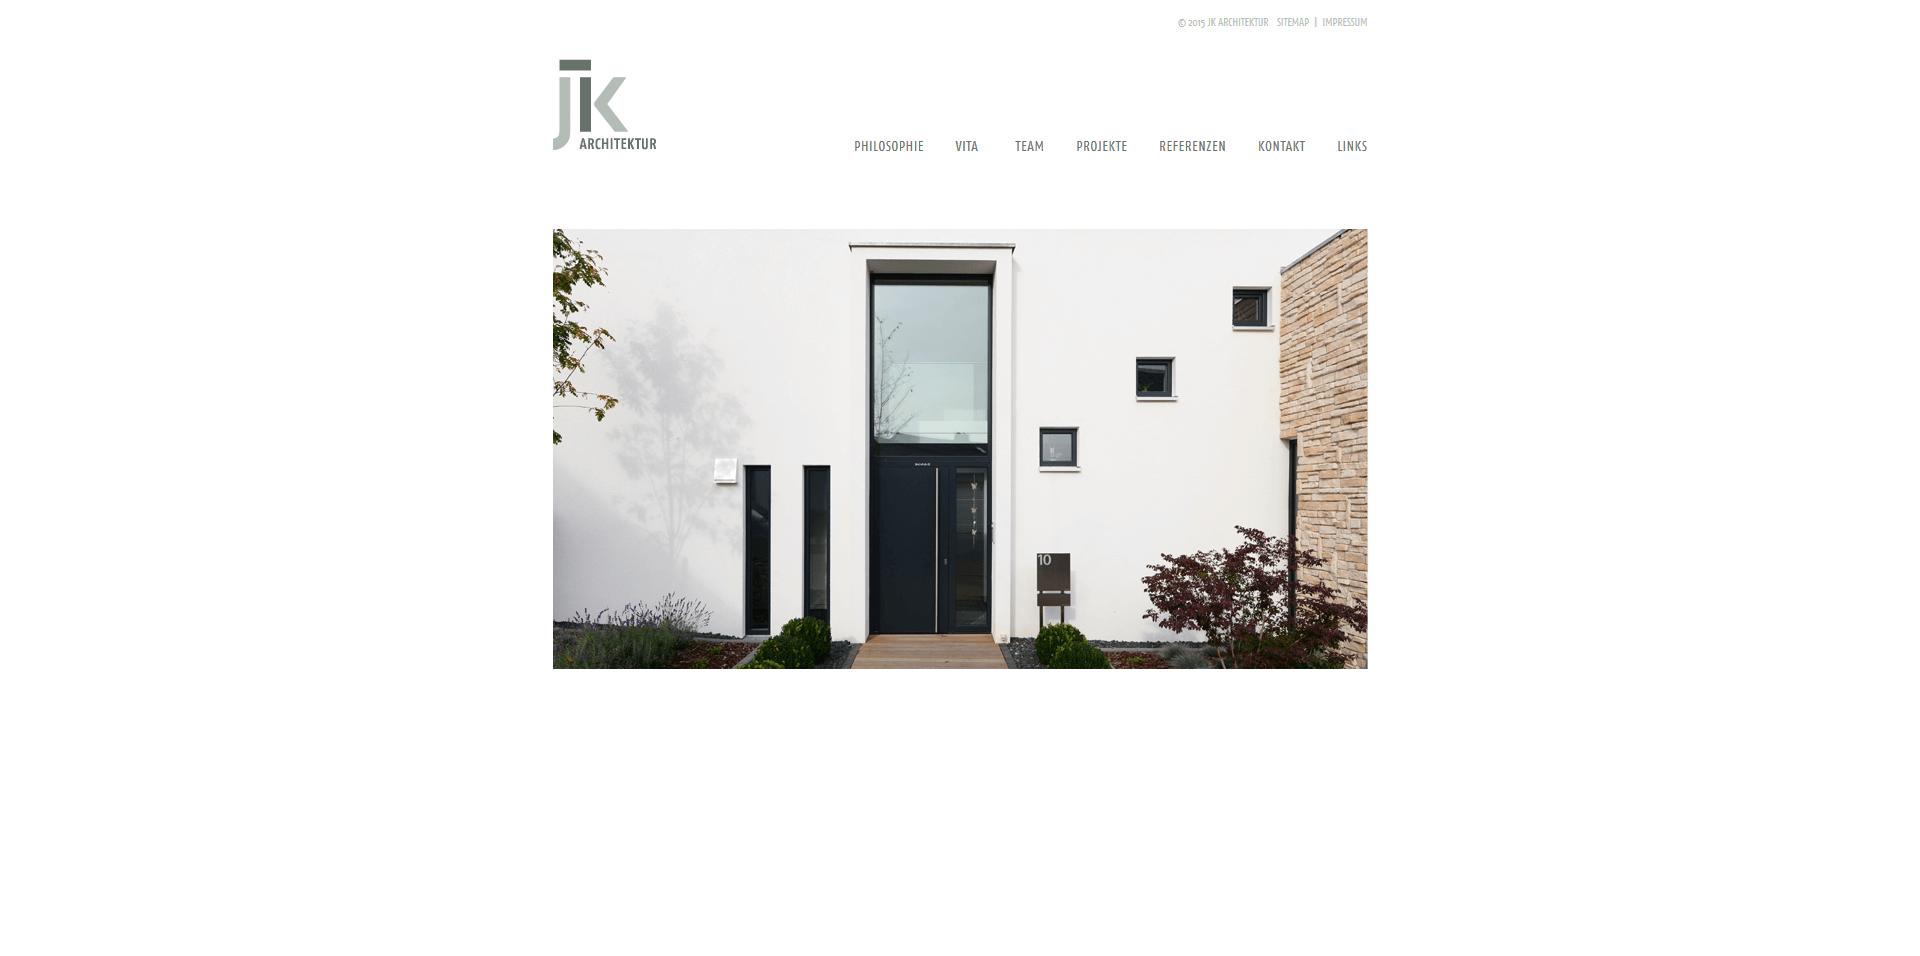 148-jk_architektur_1